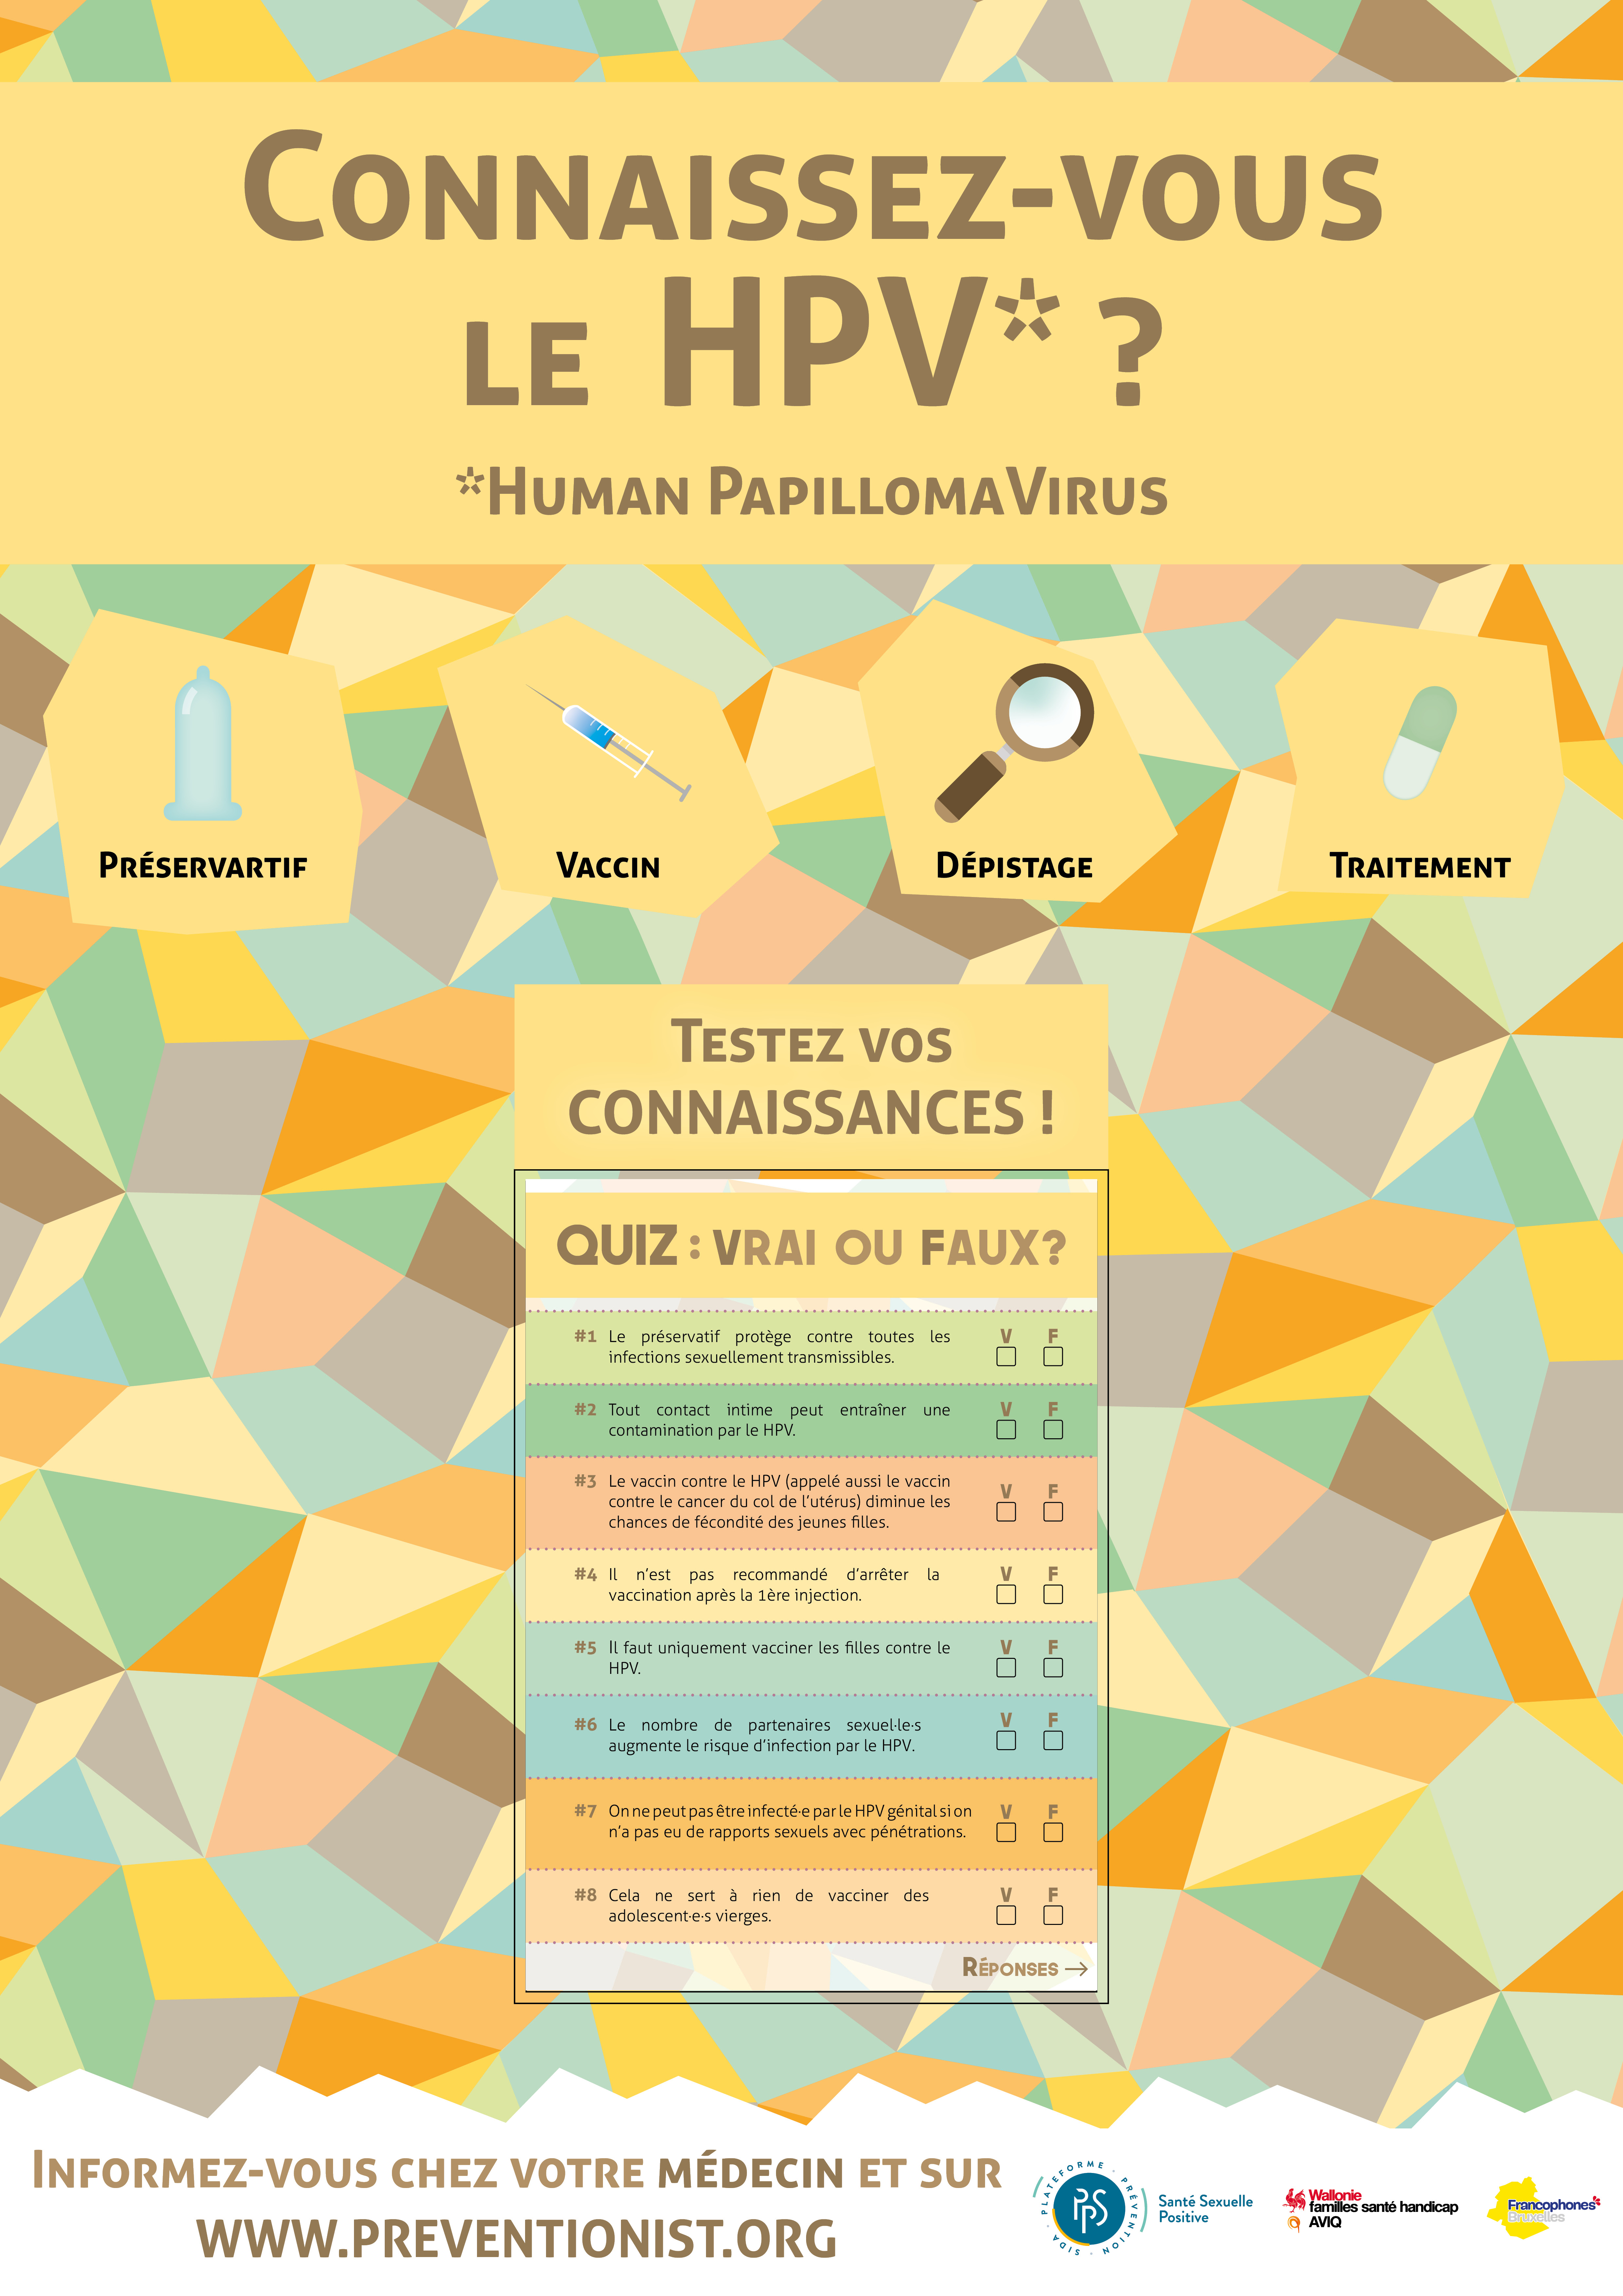 hpv preservatif a vie